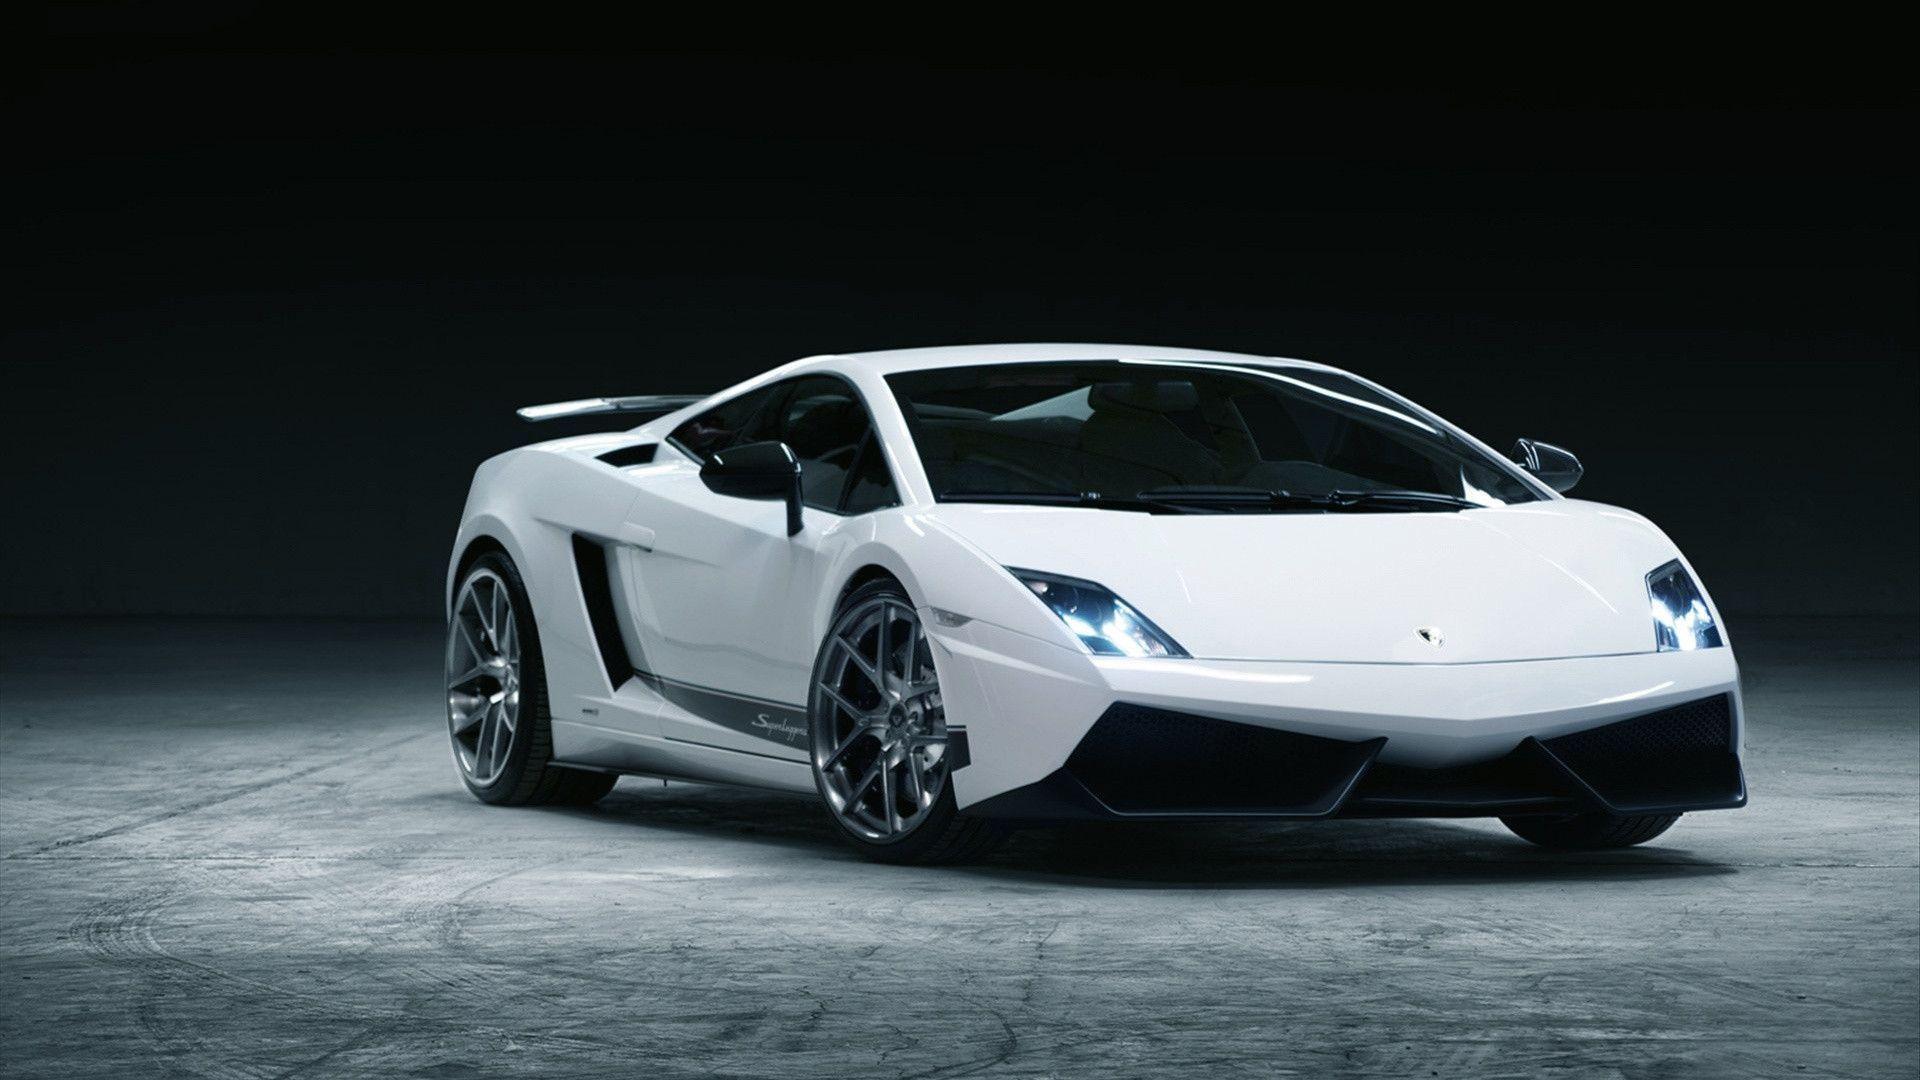 2015 lamborghini huracan concept hd desktop wallpaper 2632 - Lamborghini Huracan Hd Wallpaper